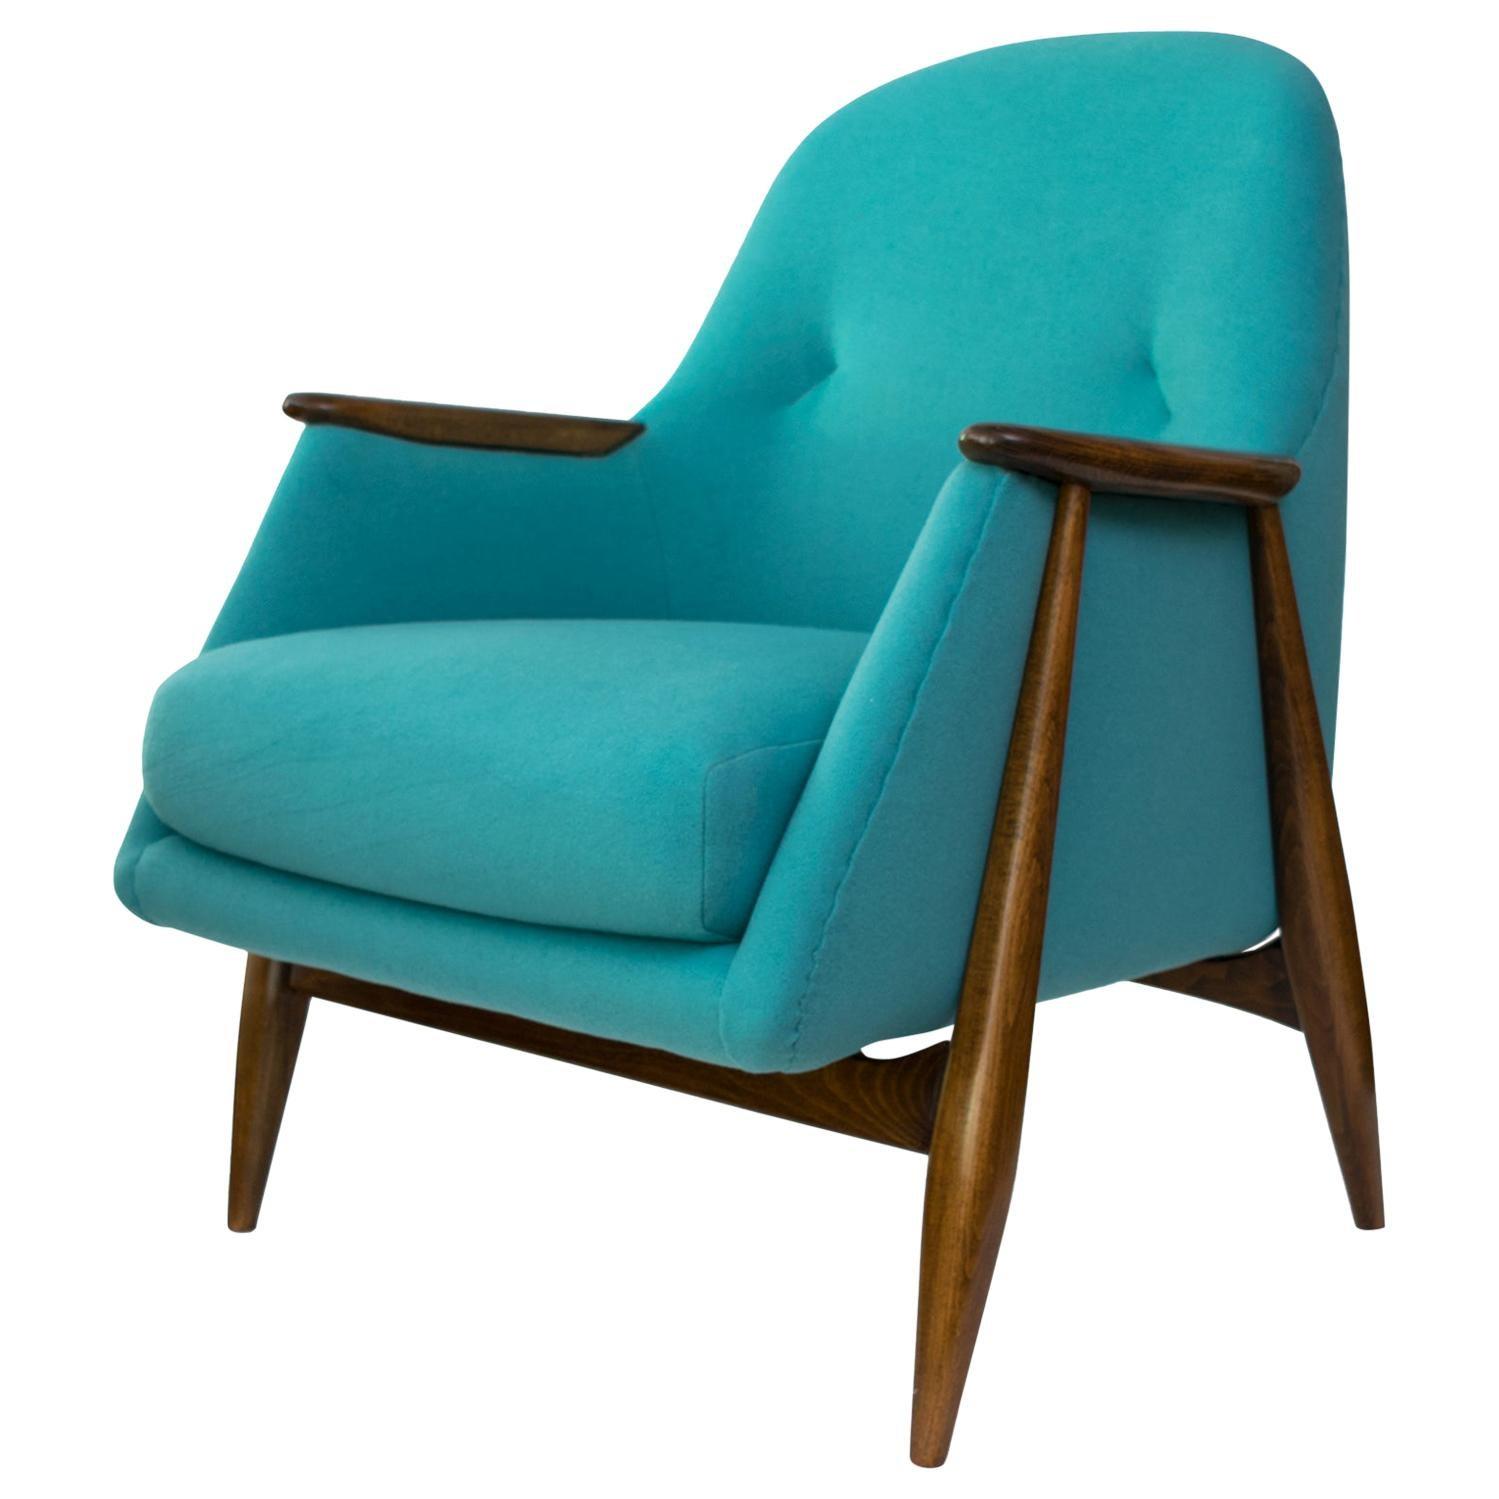 Svante Skogh Chair Scandinavian Modern for Asko, Finland, 1954